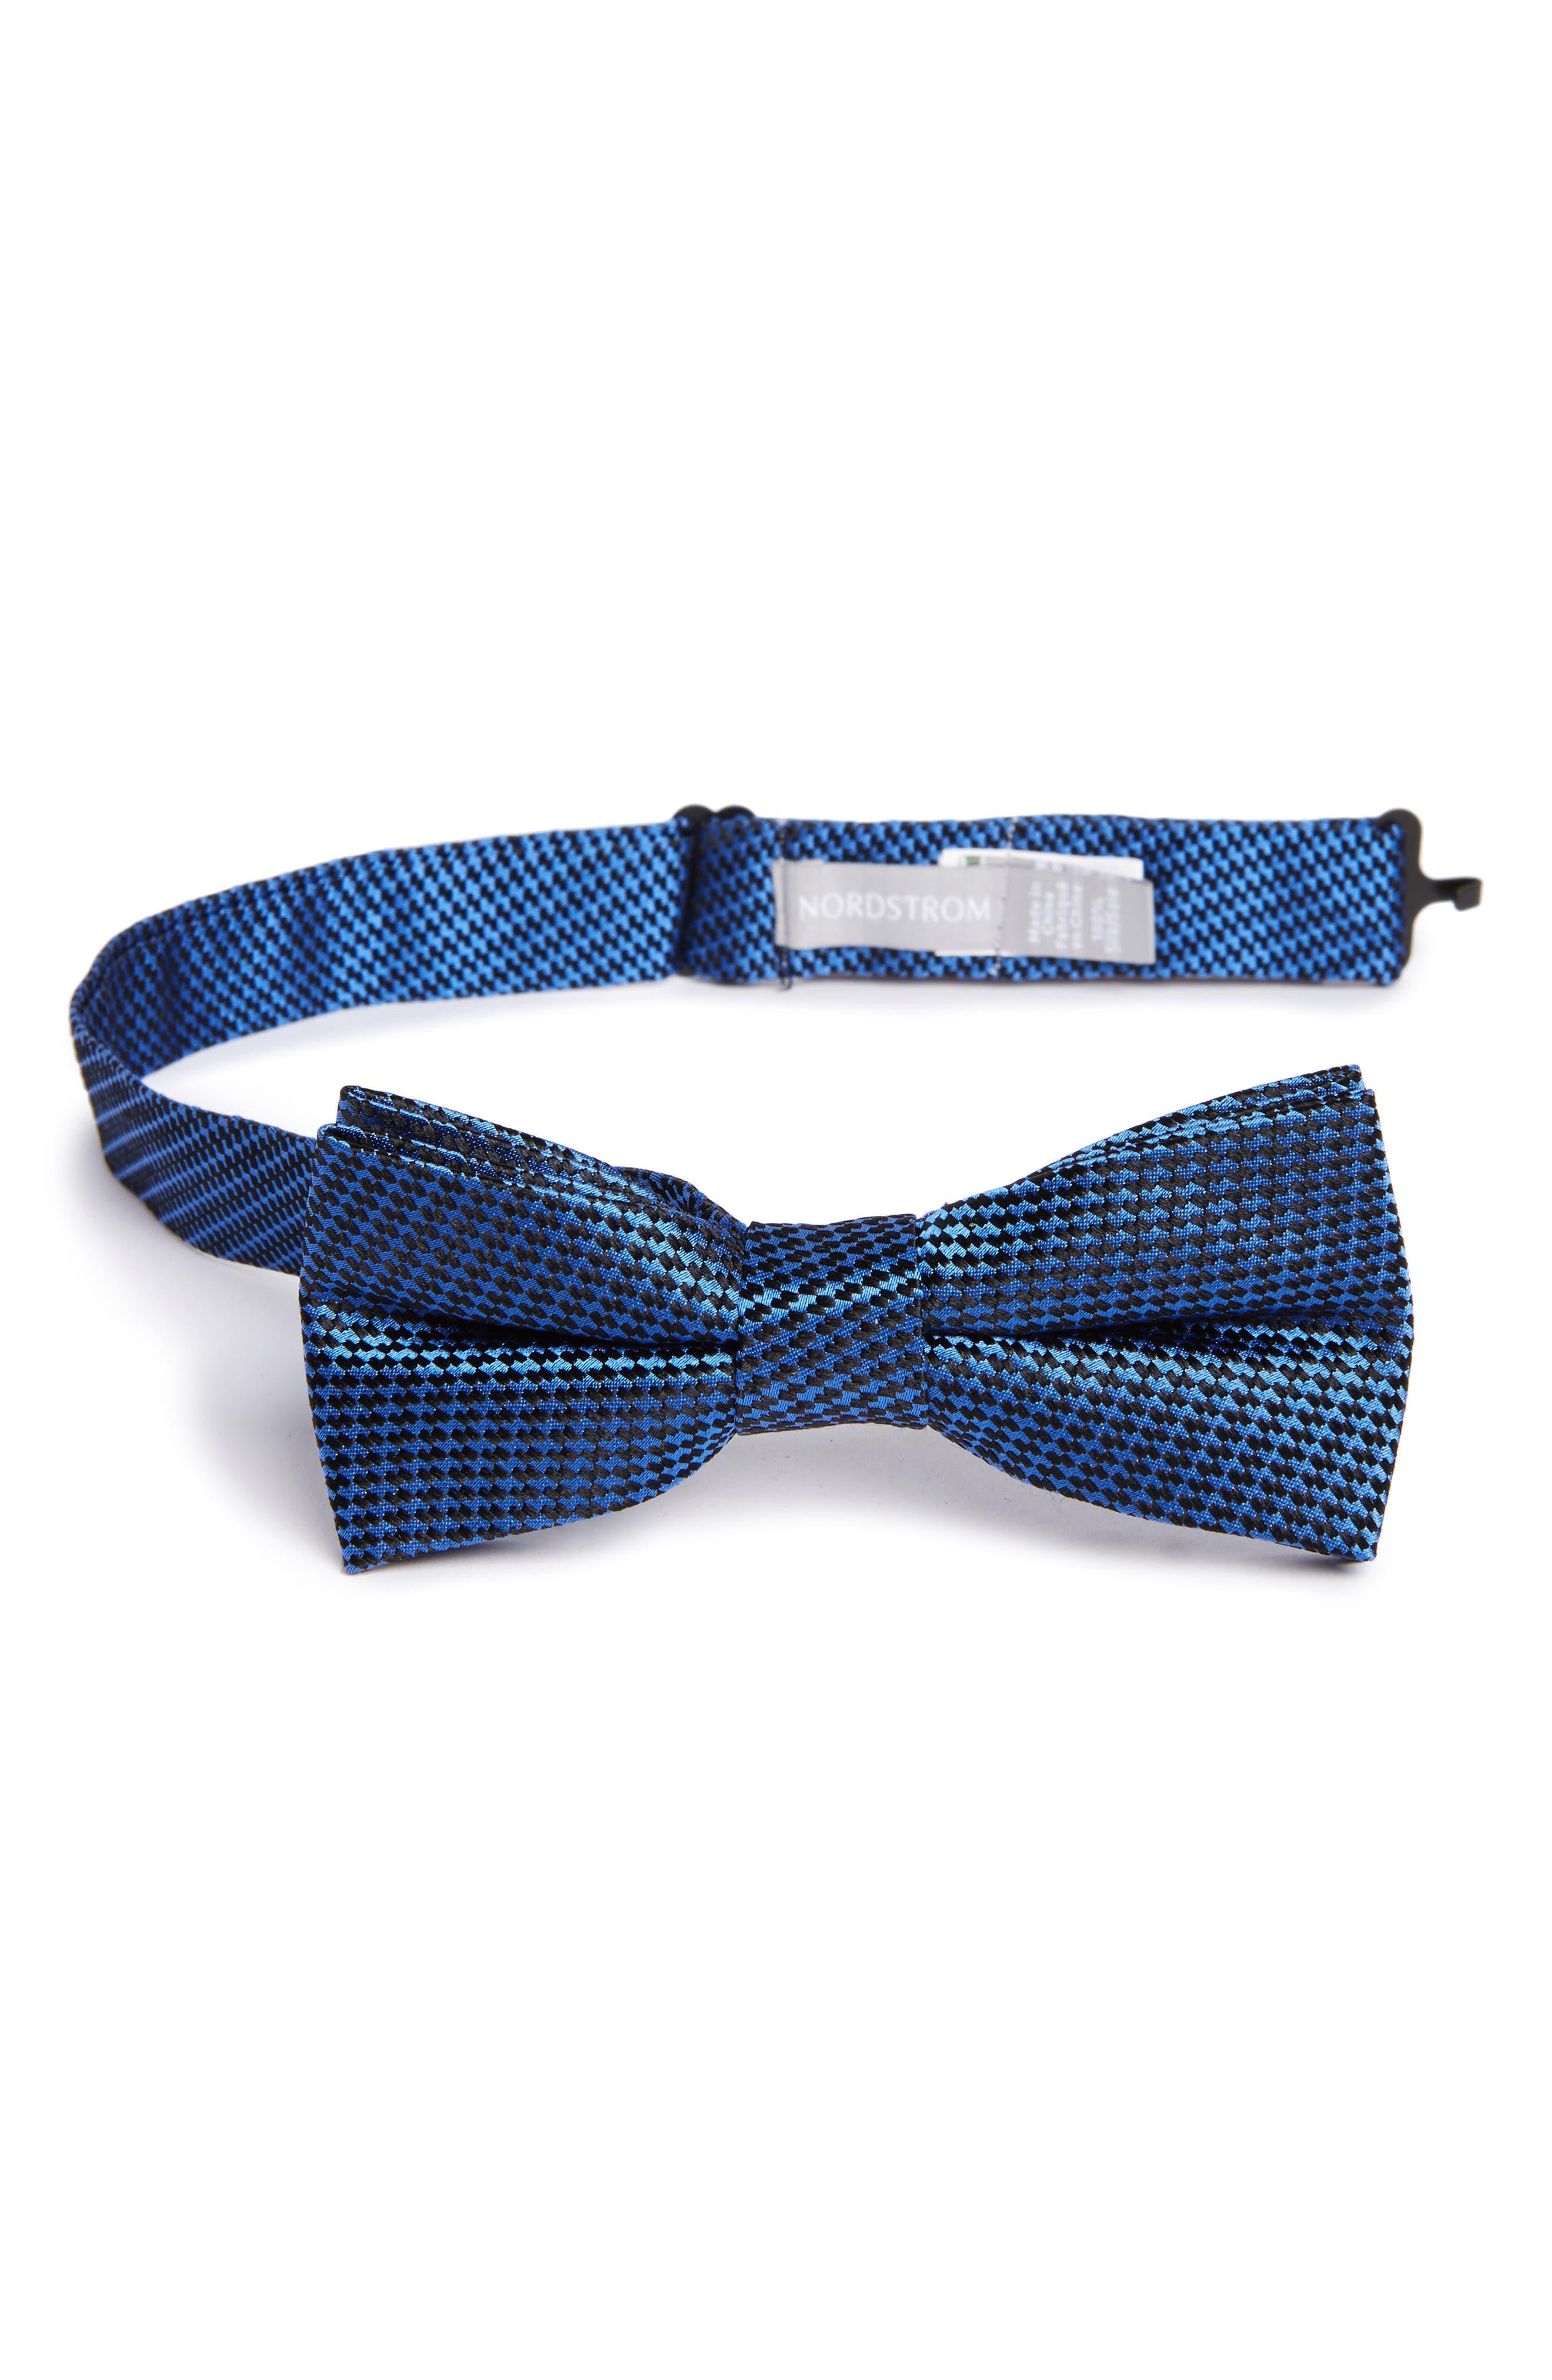 Nordstrom Neat Silk Bow Tie (Big Boys)